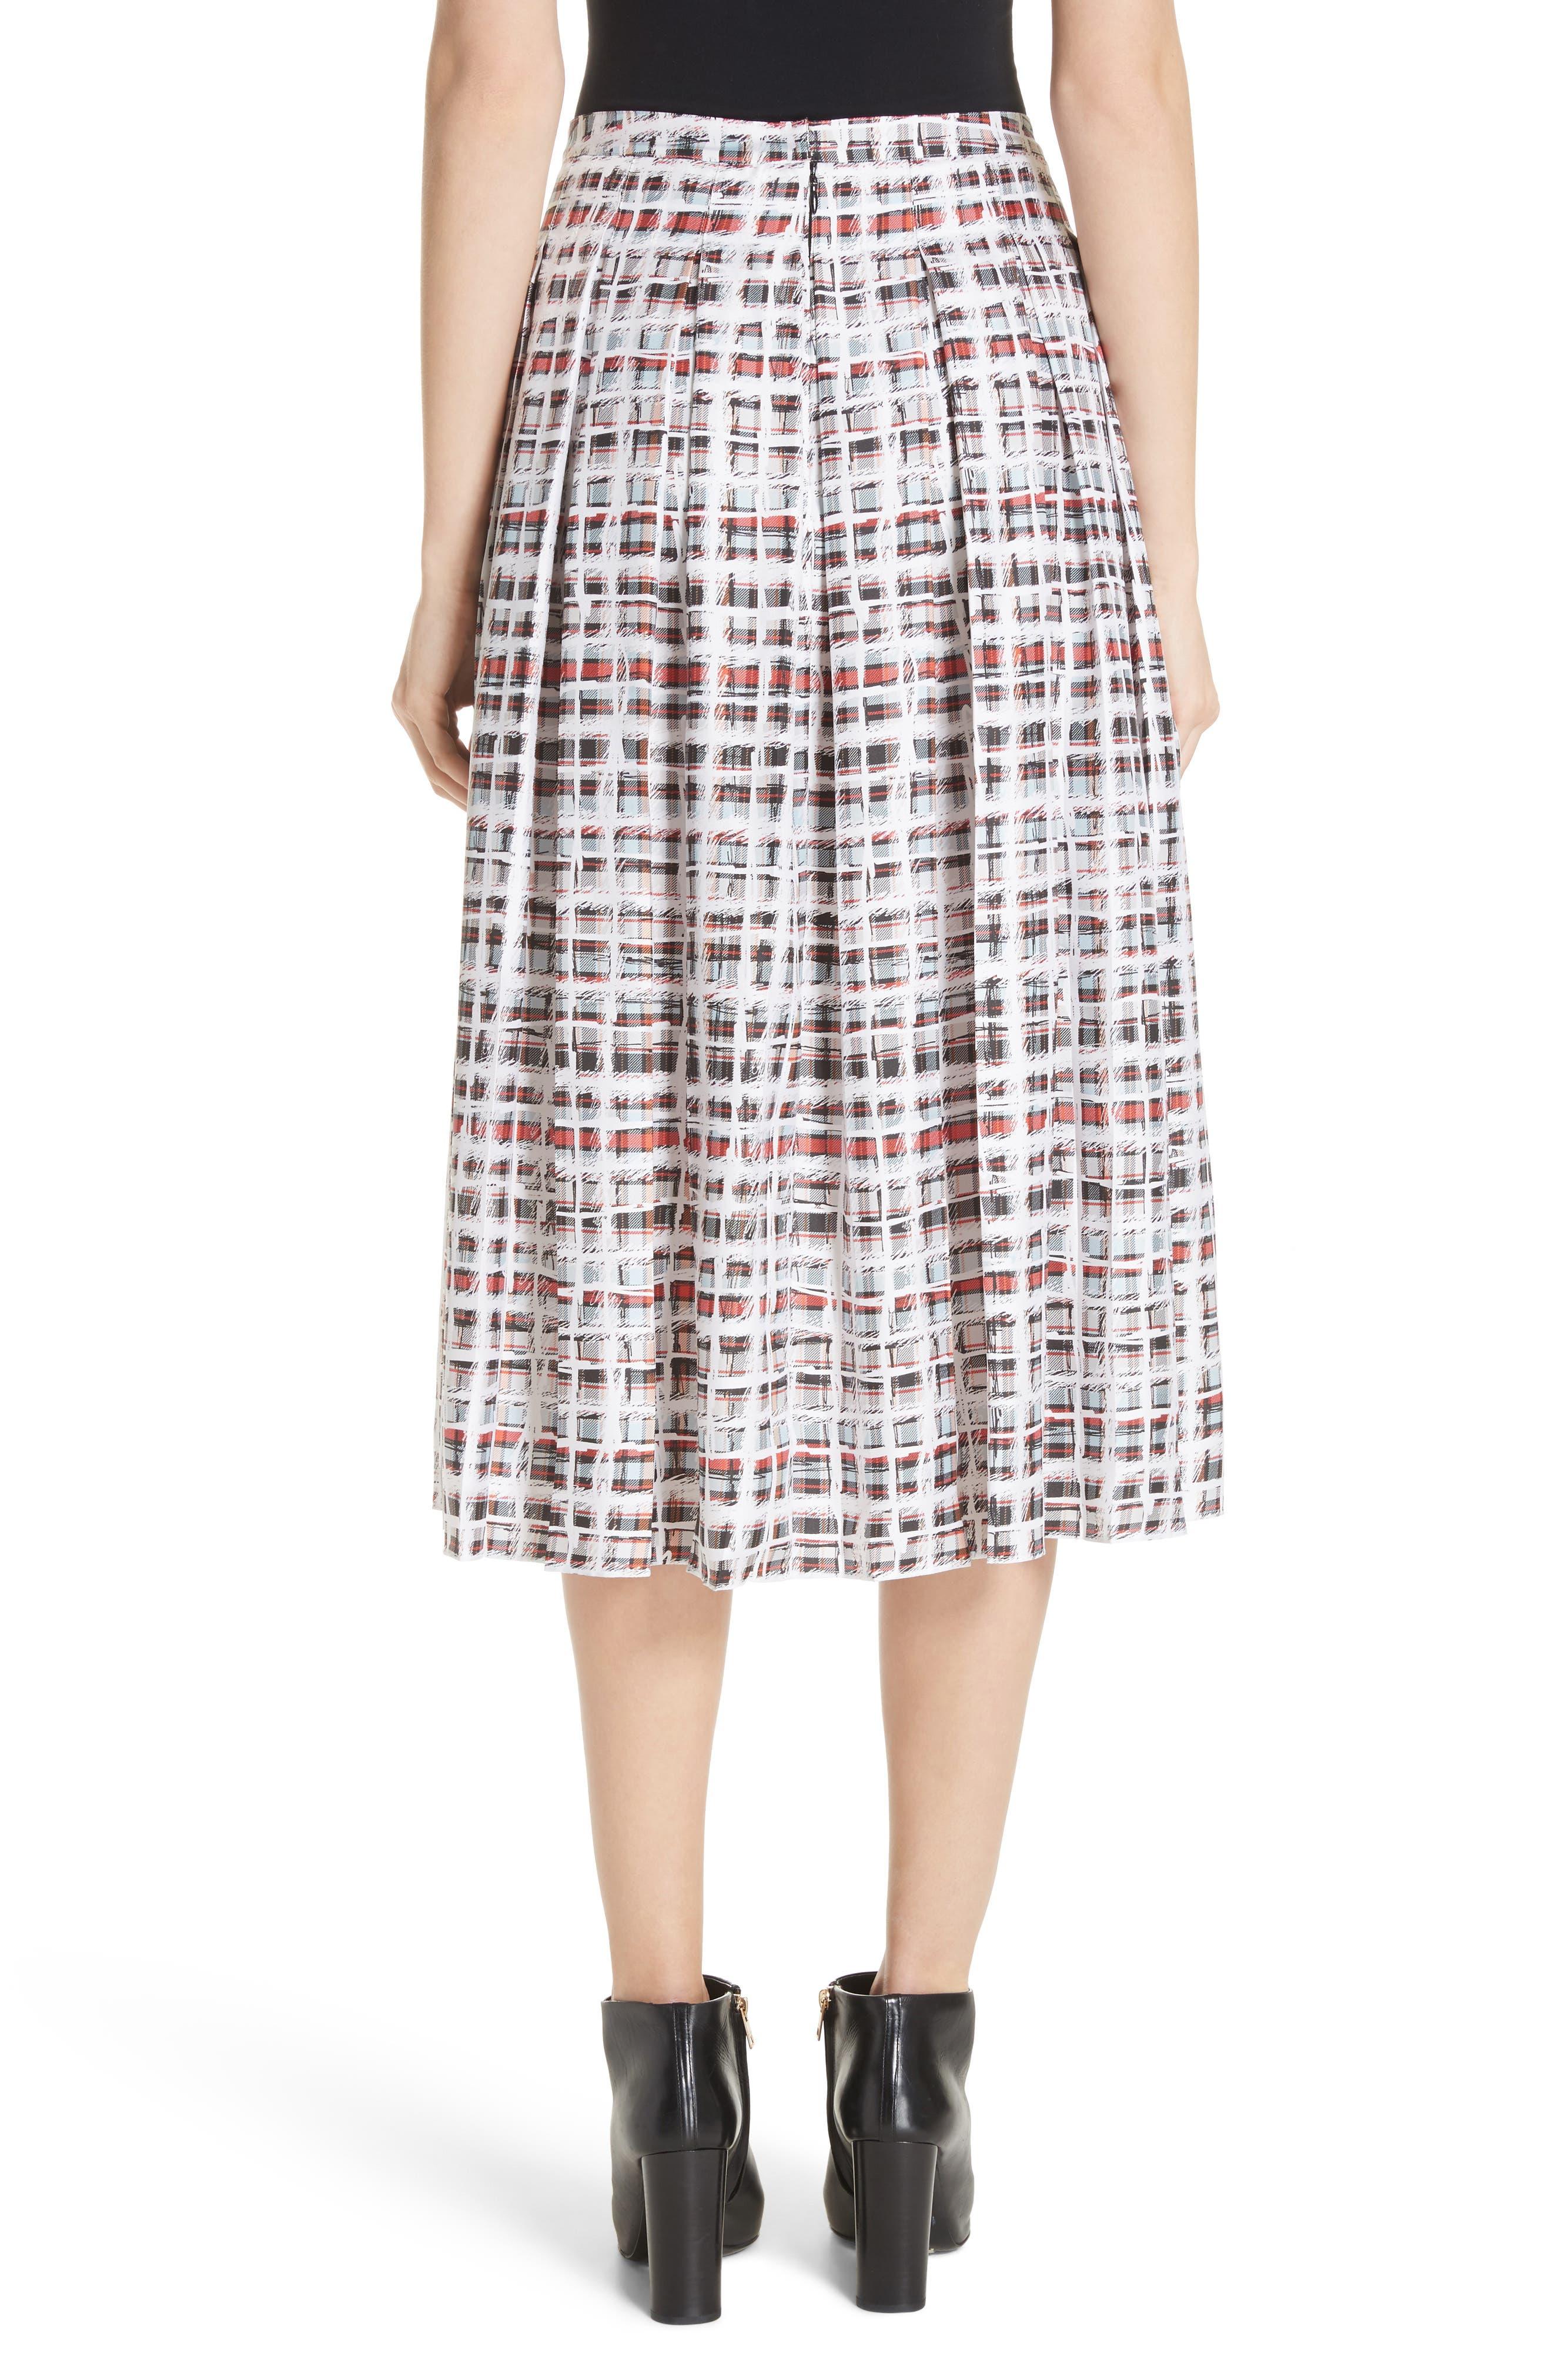 BURBERRY, Farnborough Pleated Check Silk Midi Skirt, Alternate thumbnail 2, color, CADMIUM RED